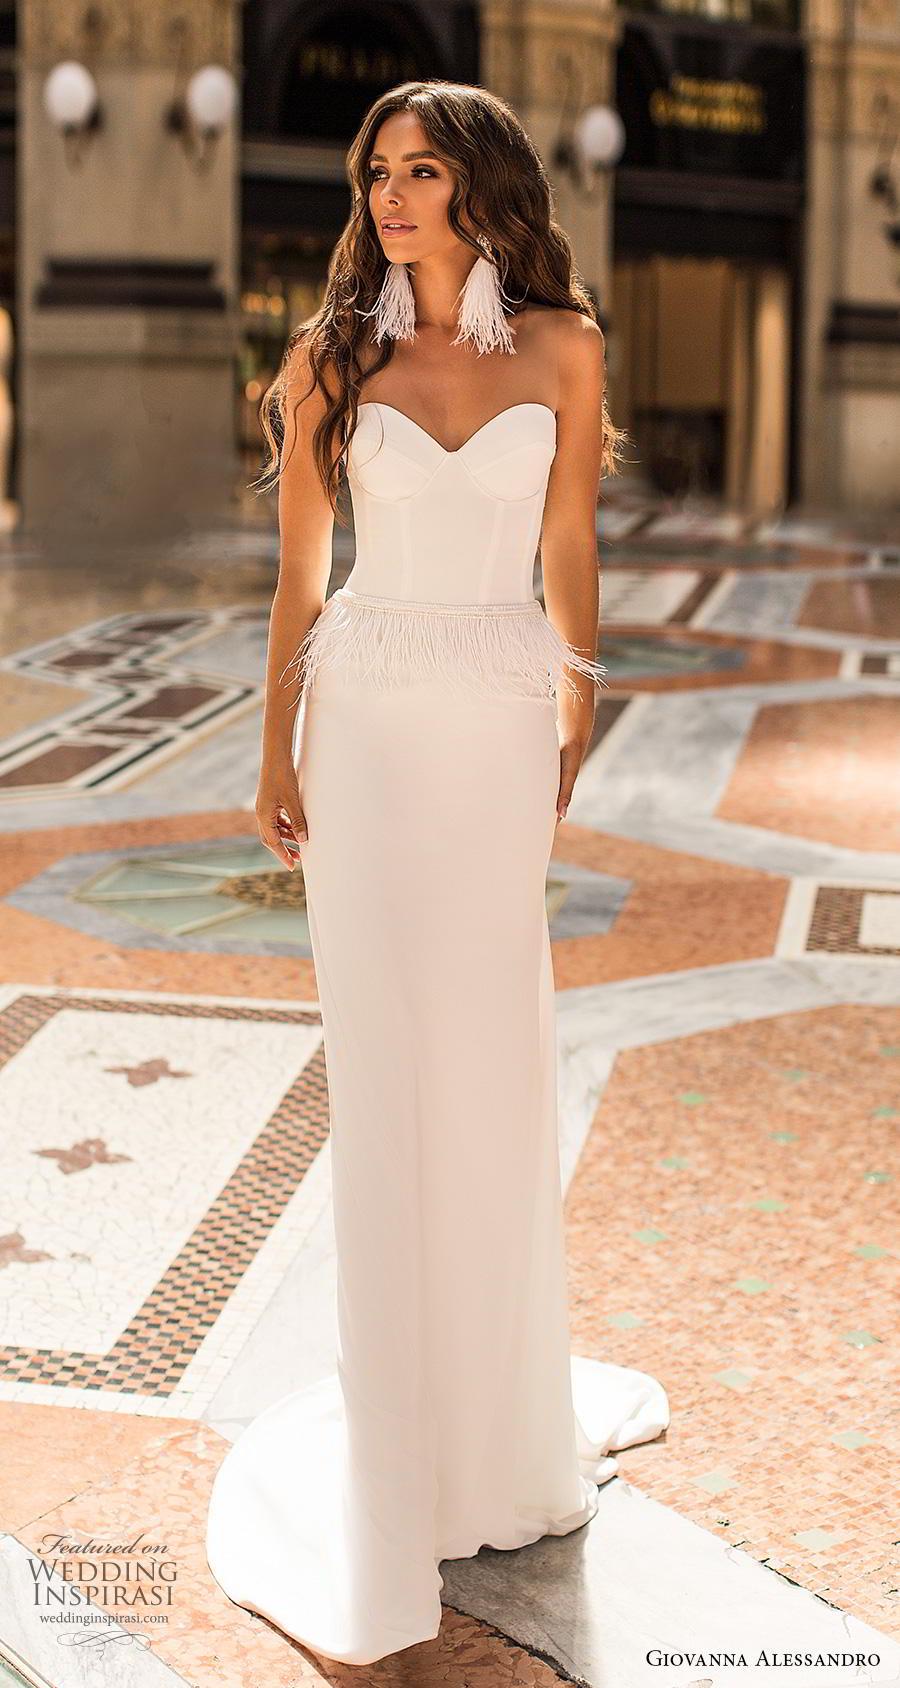 giovanna alessandro 2019 bridal strapless sweetheart neckline bustier bodice simple minimalist fringe waist elegant sheath wedding dress short train (12) mv